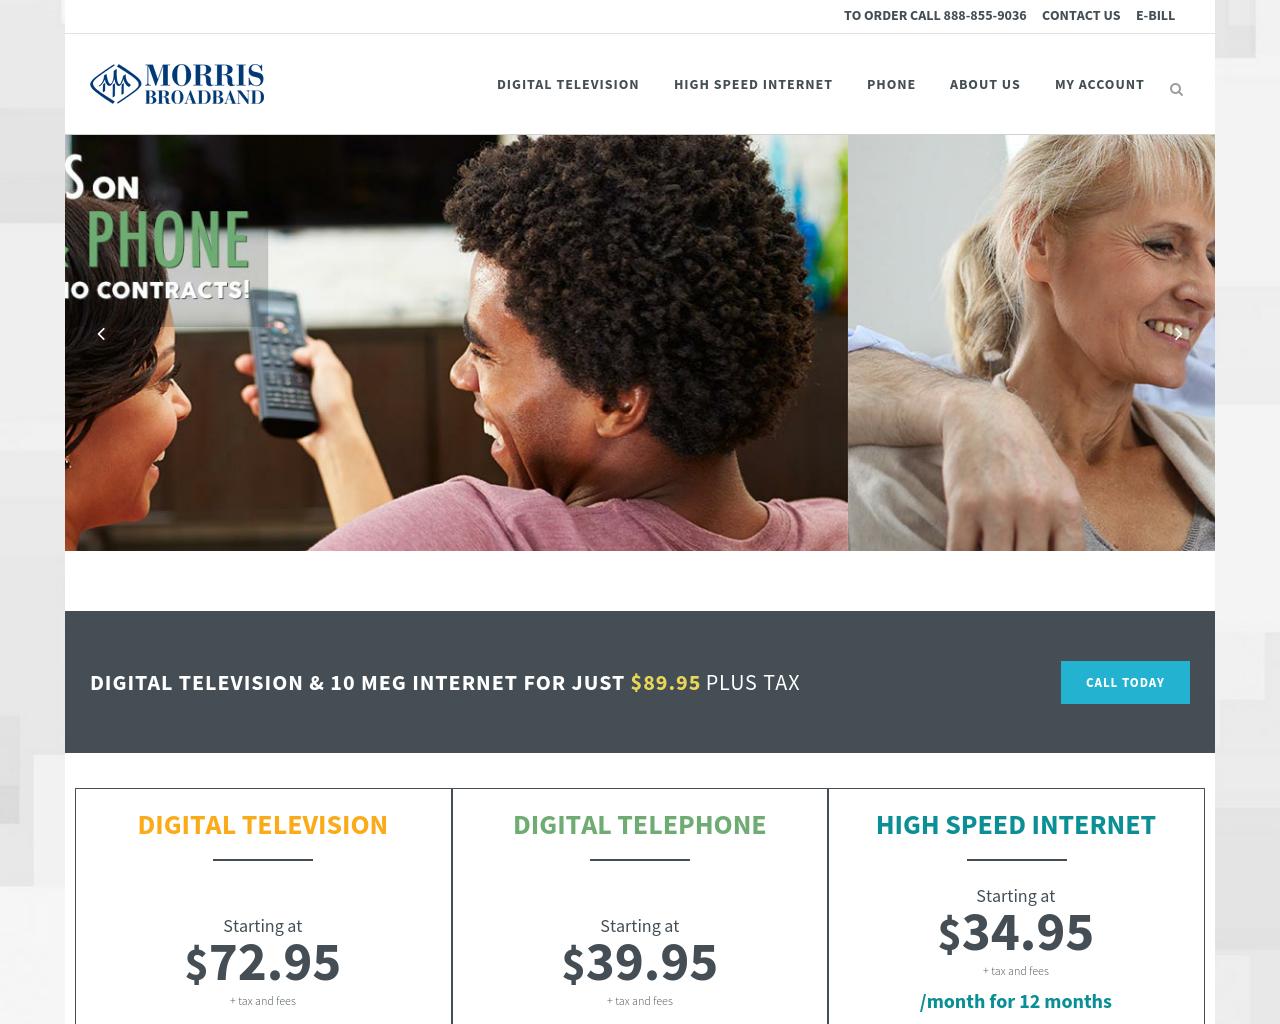 MORRIS-BROADBAND-Advertising-Reviews-Pricing